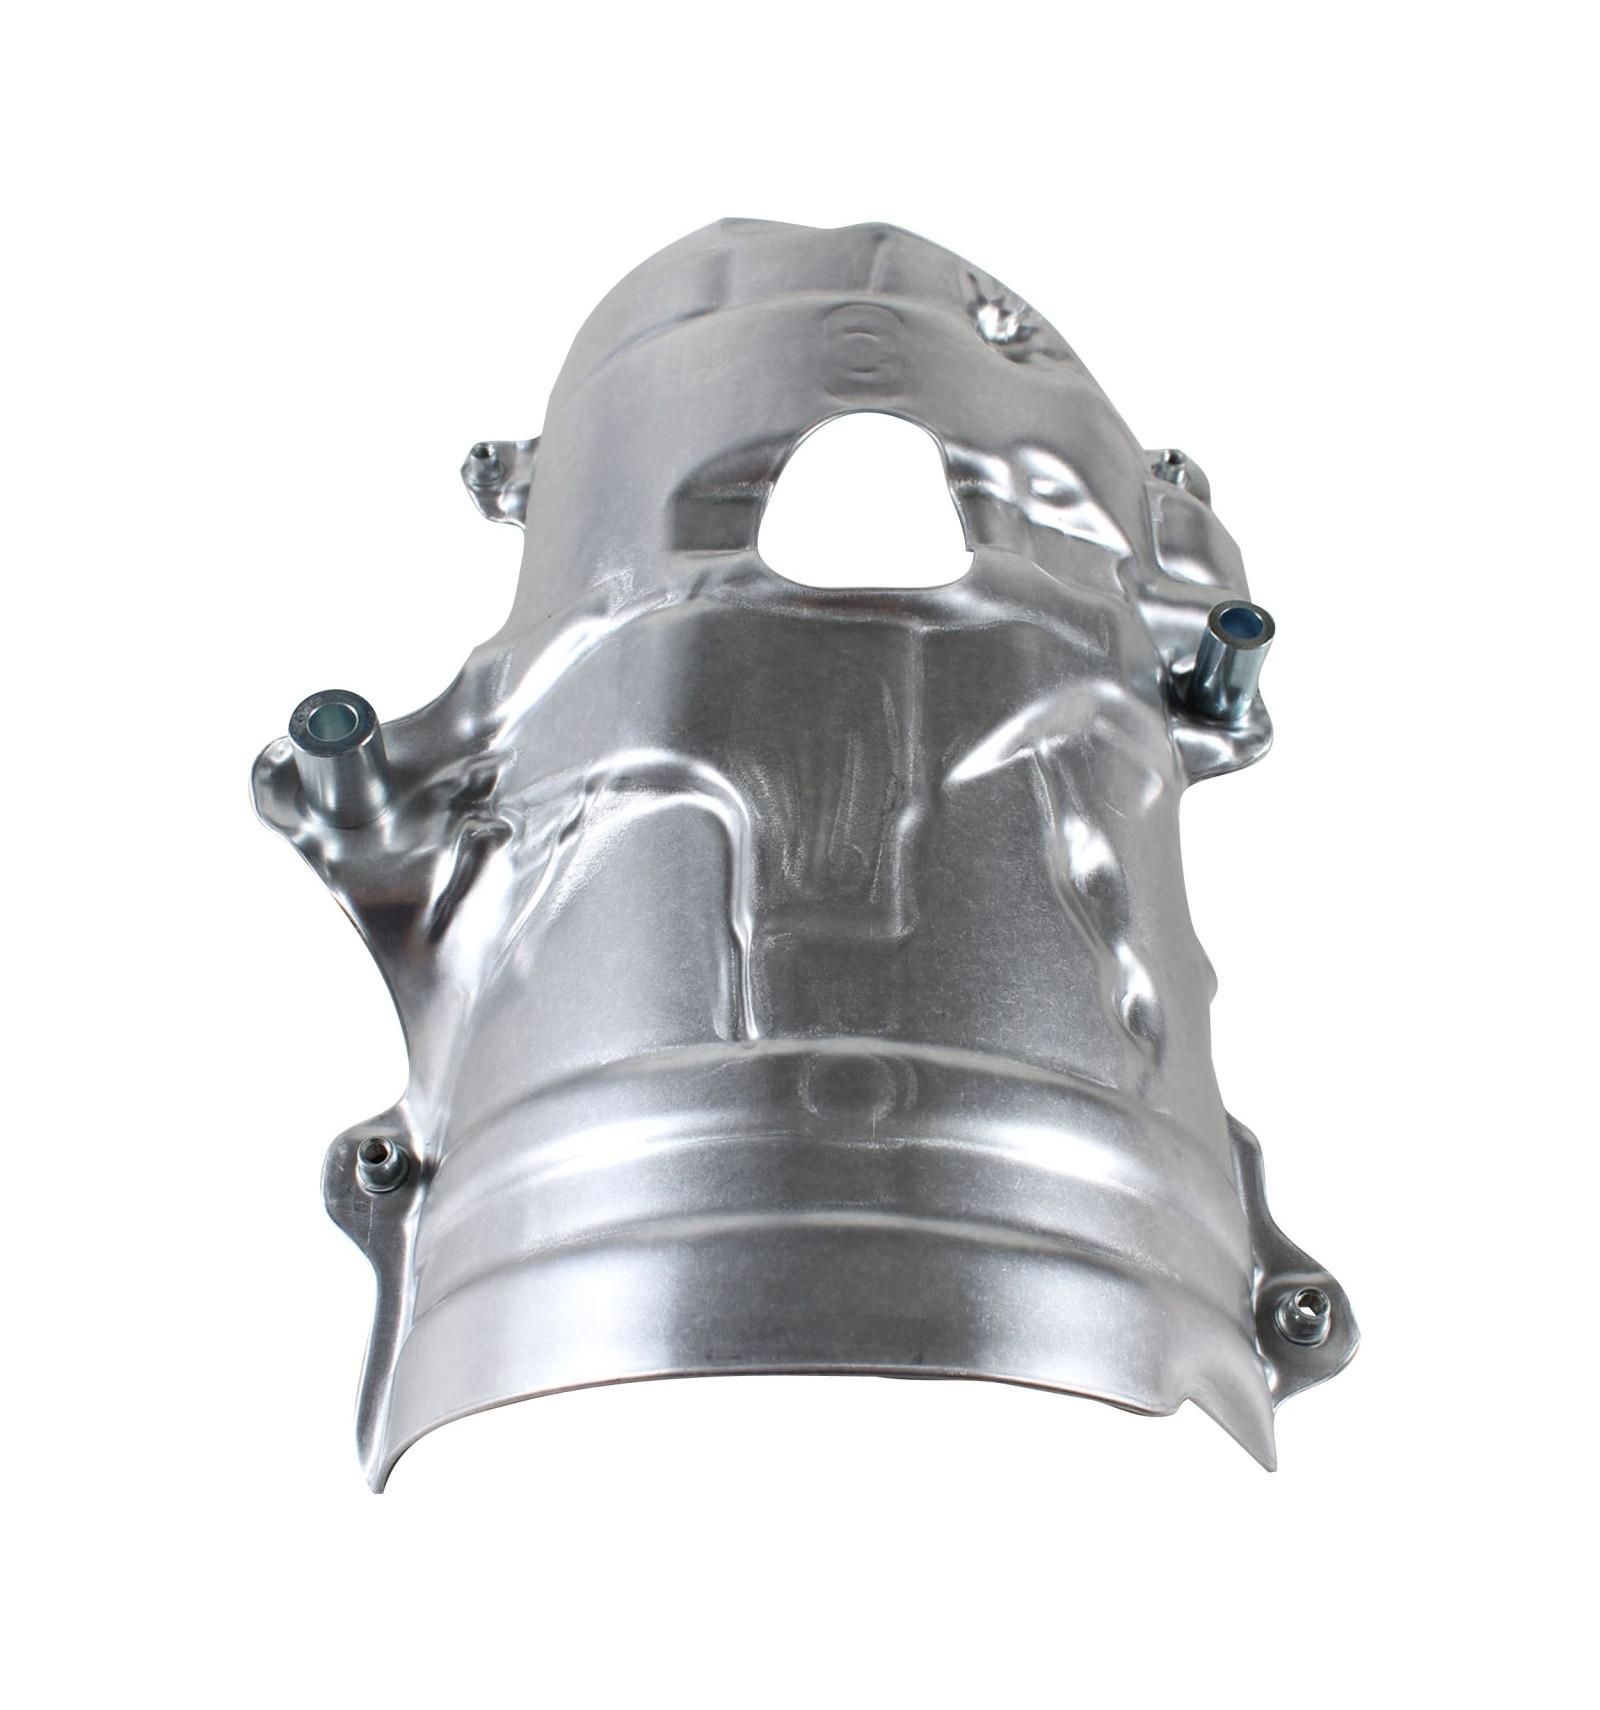 Honda Crv Dimensions >> Citroen Ecran thermique echappement arriere Citroen ...